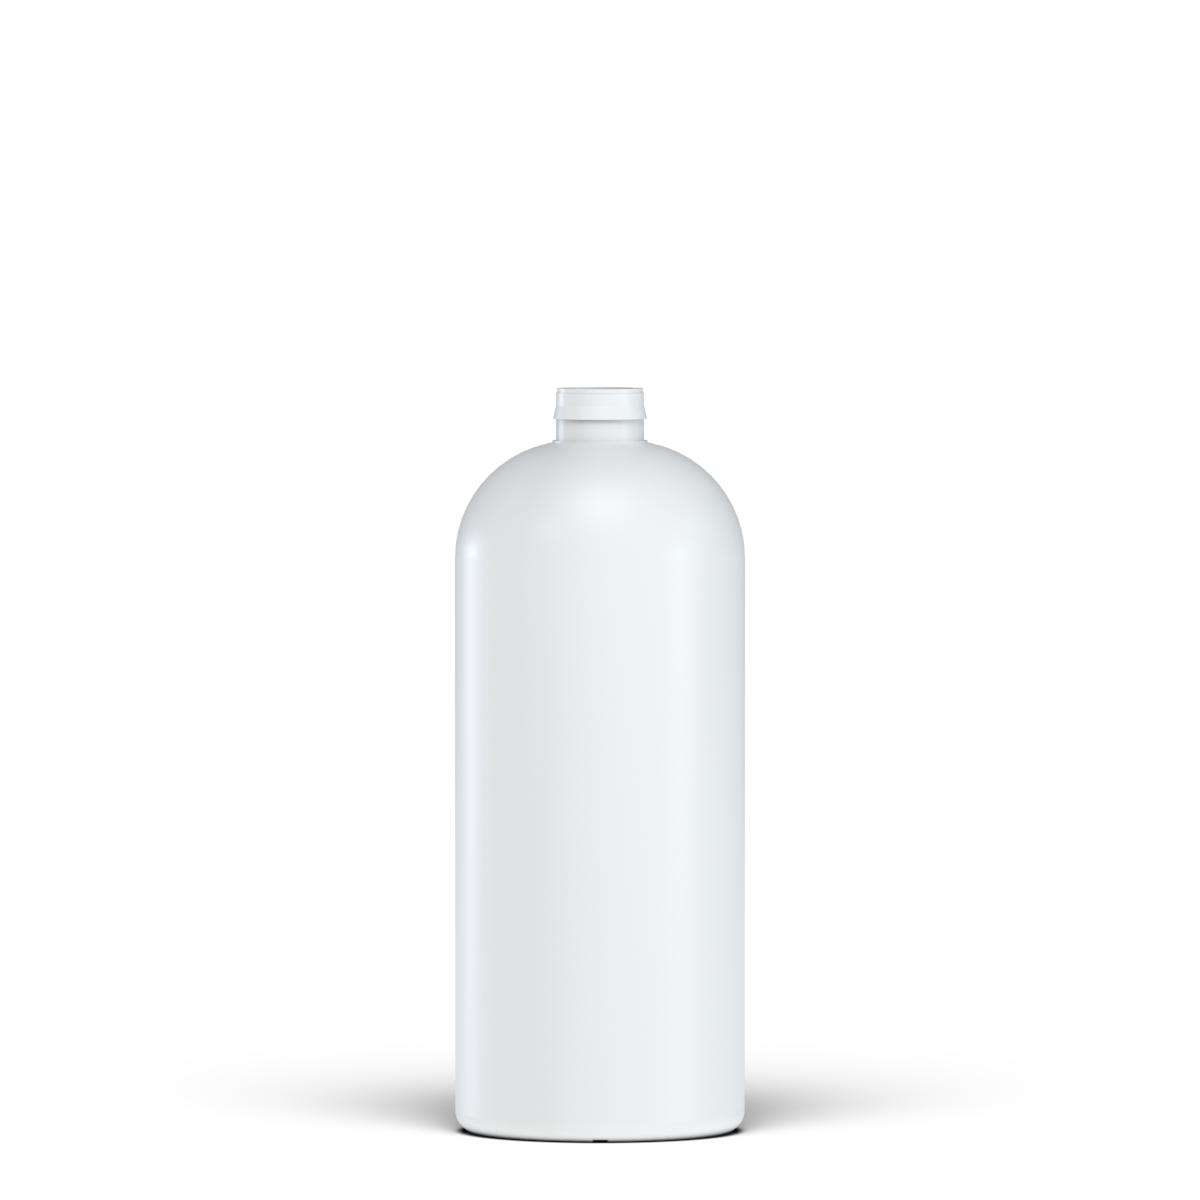 Cylindrical bottle for vinyl glue 250 ml HDPE, neck snap-on, style NAIROBI